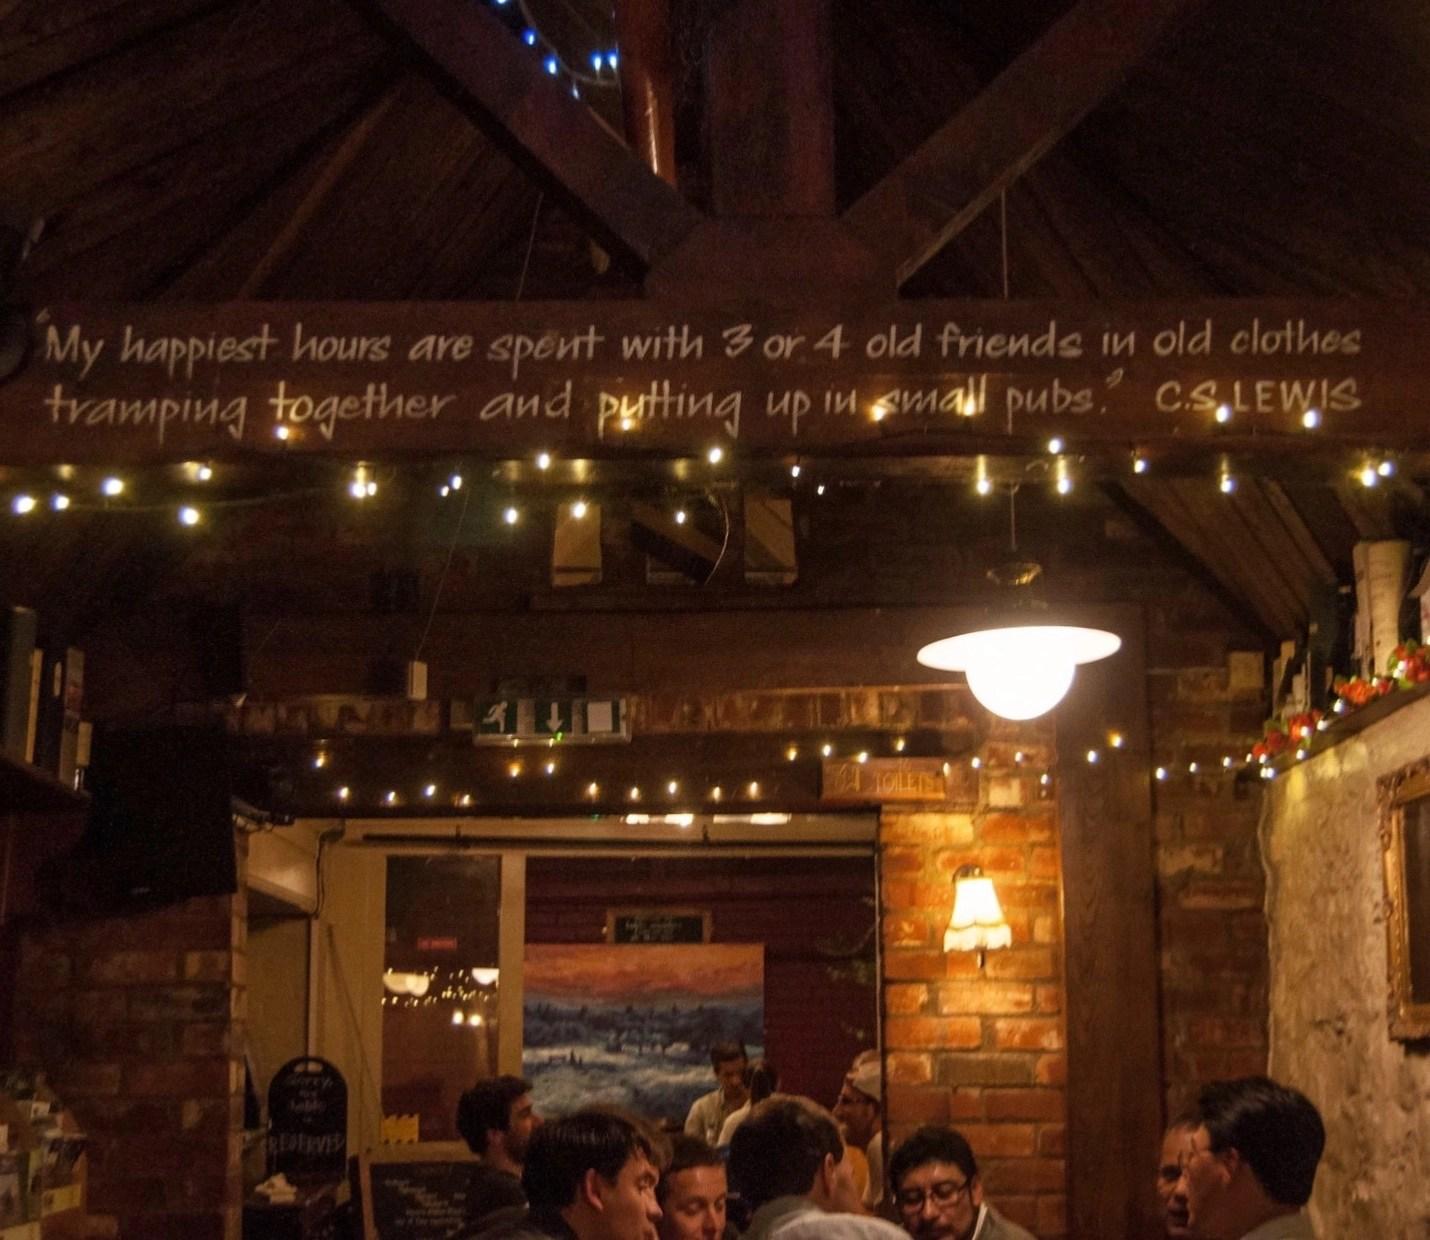 Eagle & Child Pub Interior - Meraj Chhaya via Flickr